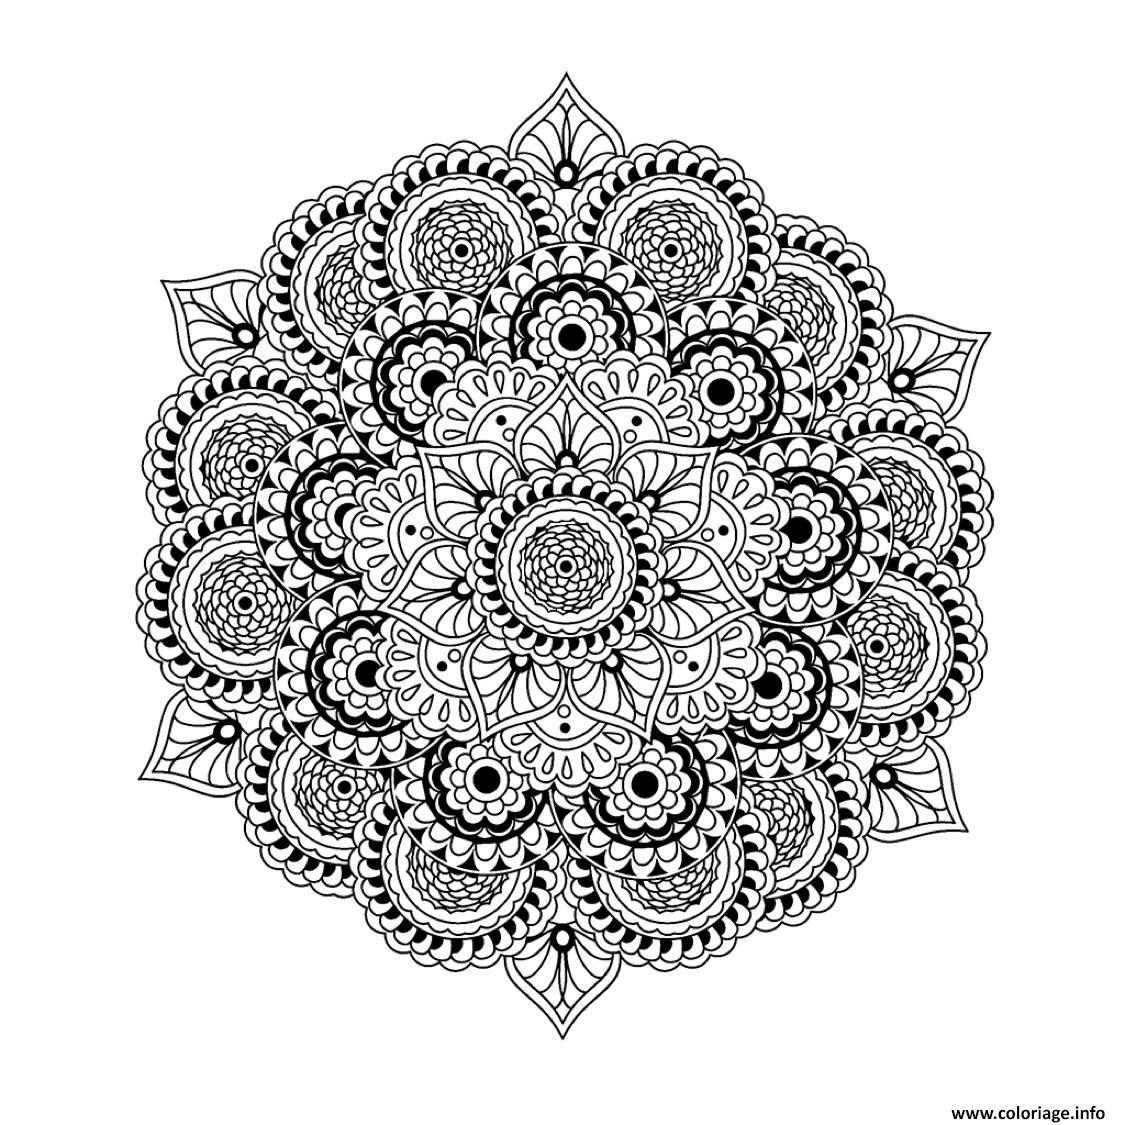 8 Extraordinaire Coloriage Mandala Difficile Fleur Images Mandala Difficile Coloriage Mandala Mandala A Imprimer